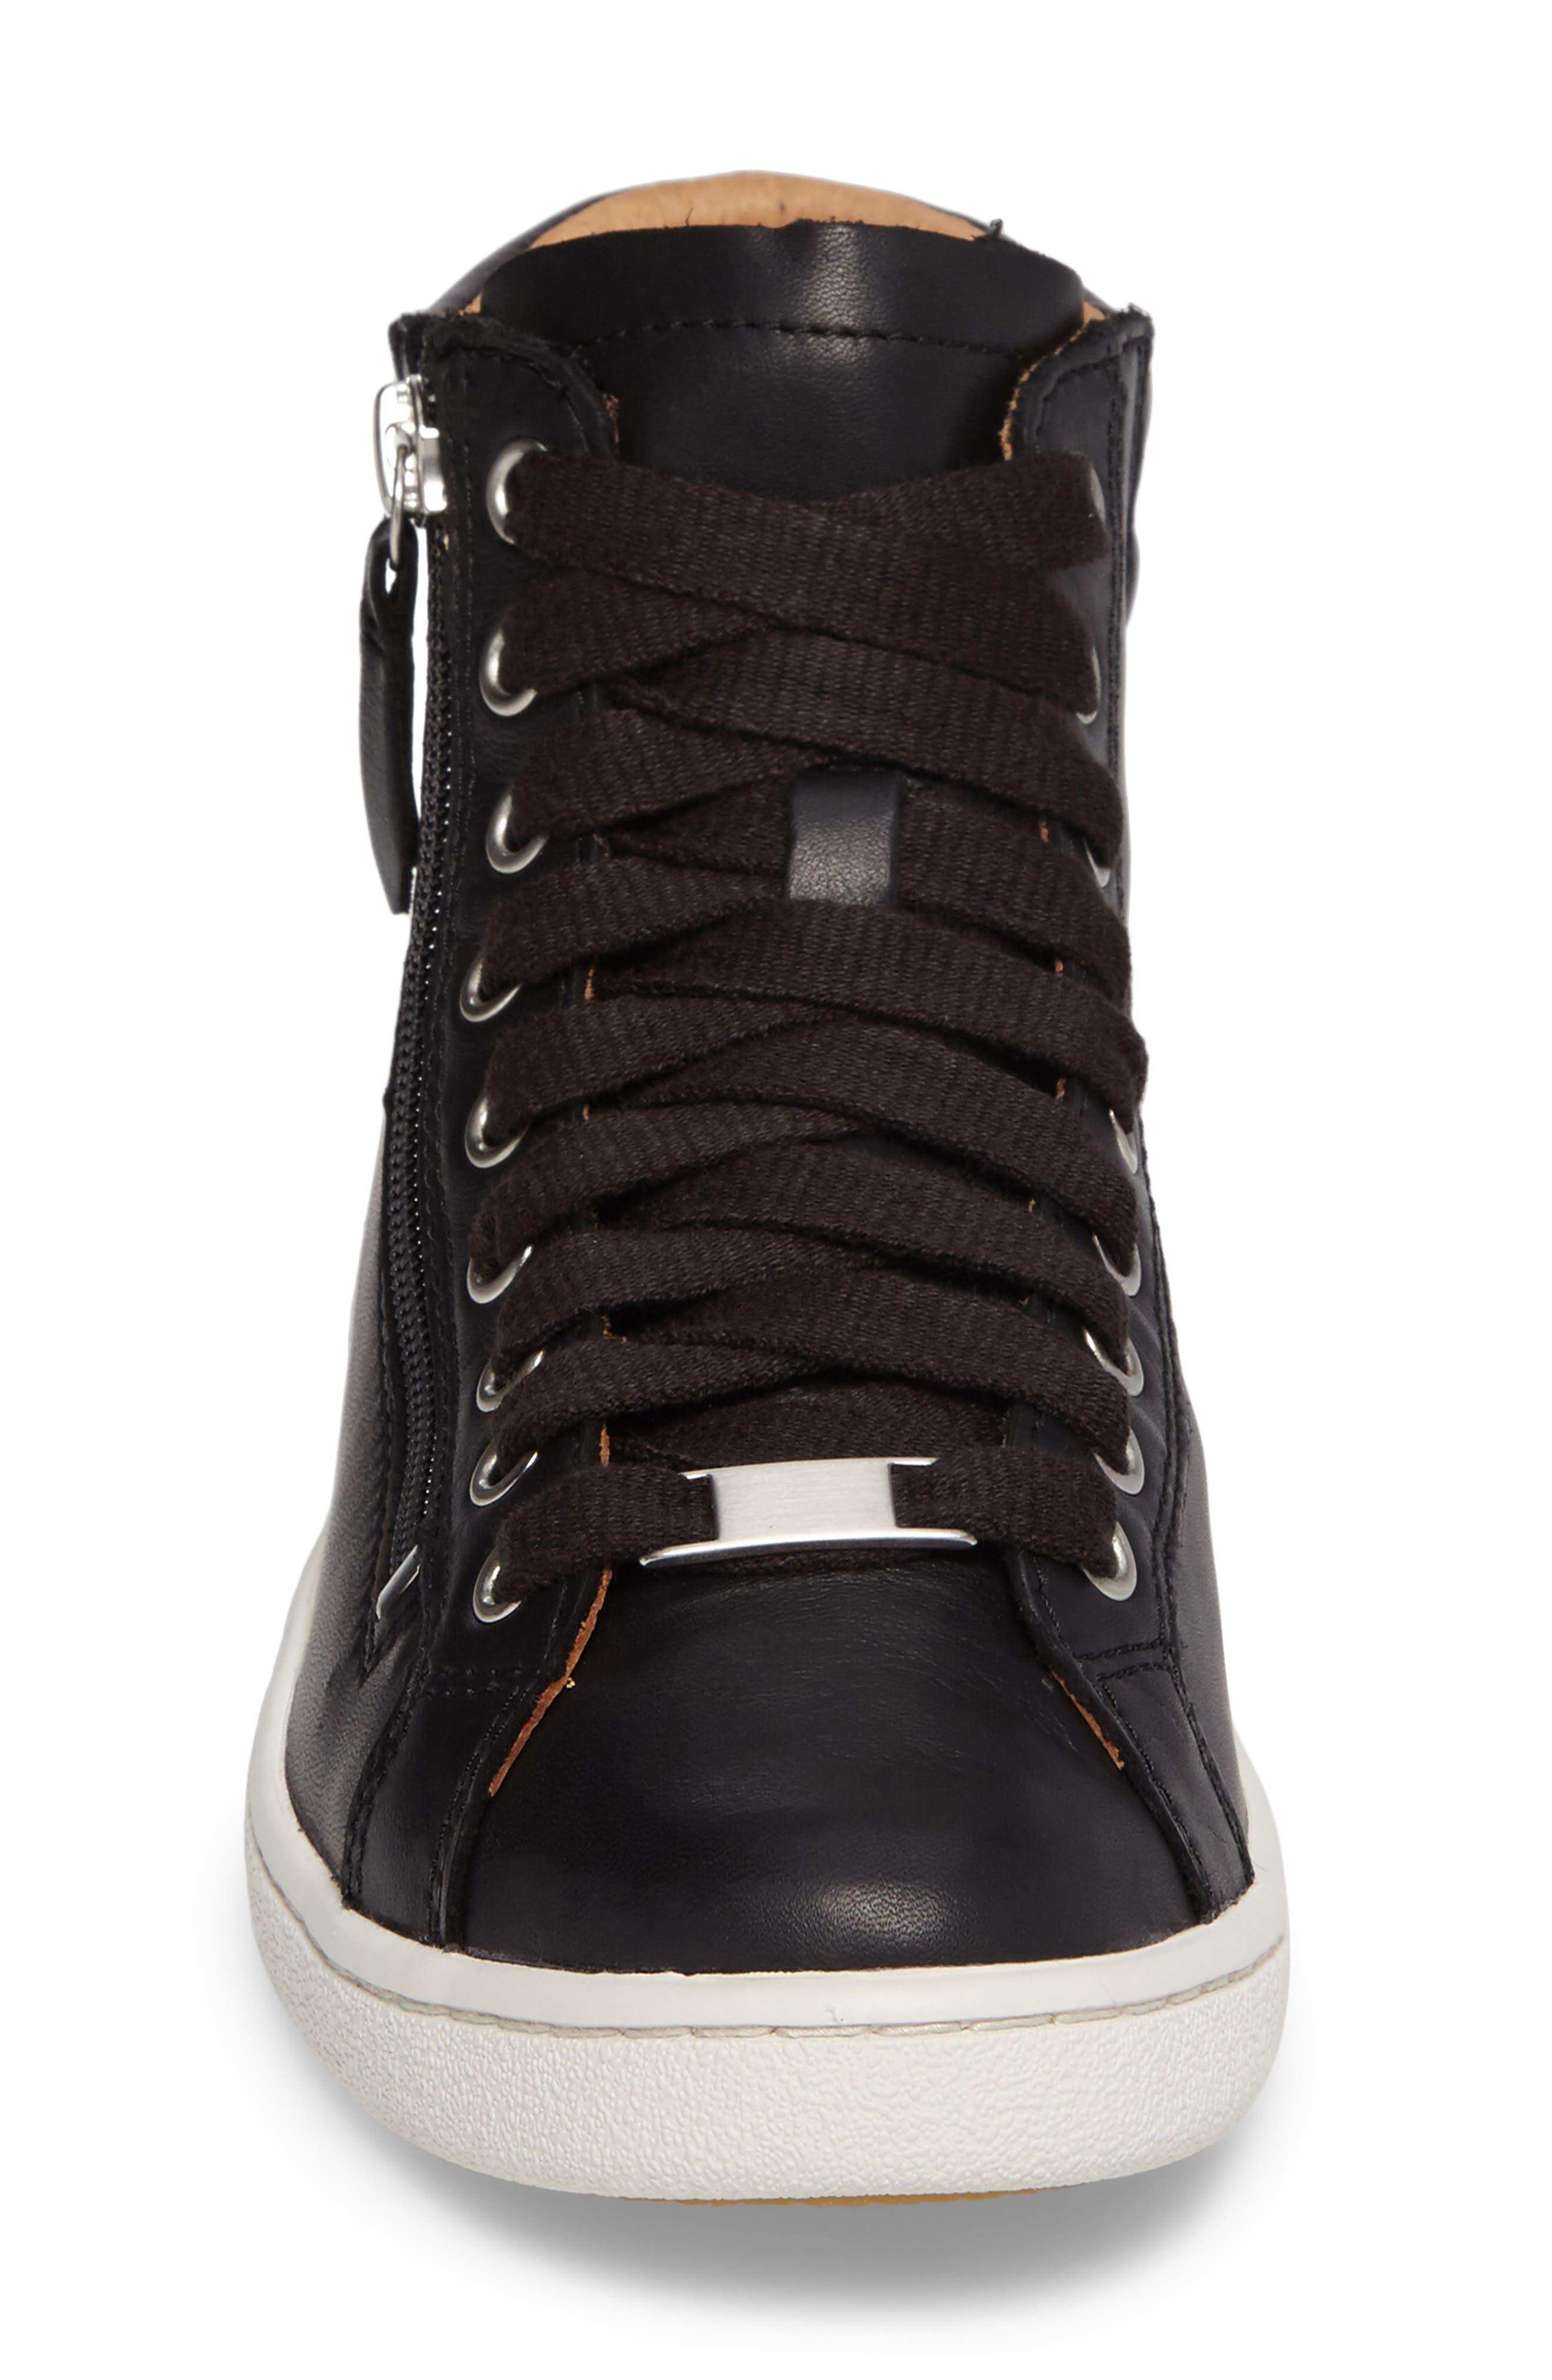 UGG<SUP>®</SUP>, UGG Olive High Top Sneaker, Alternate thumbnail 4, color, BLACK LEATHER